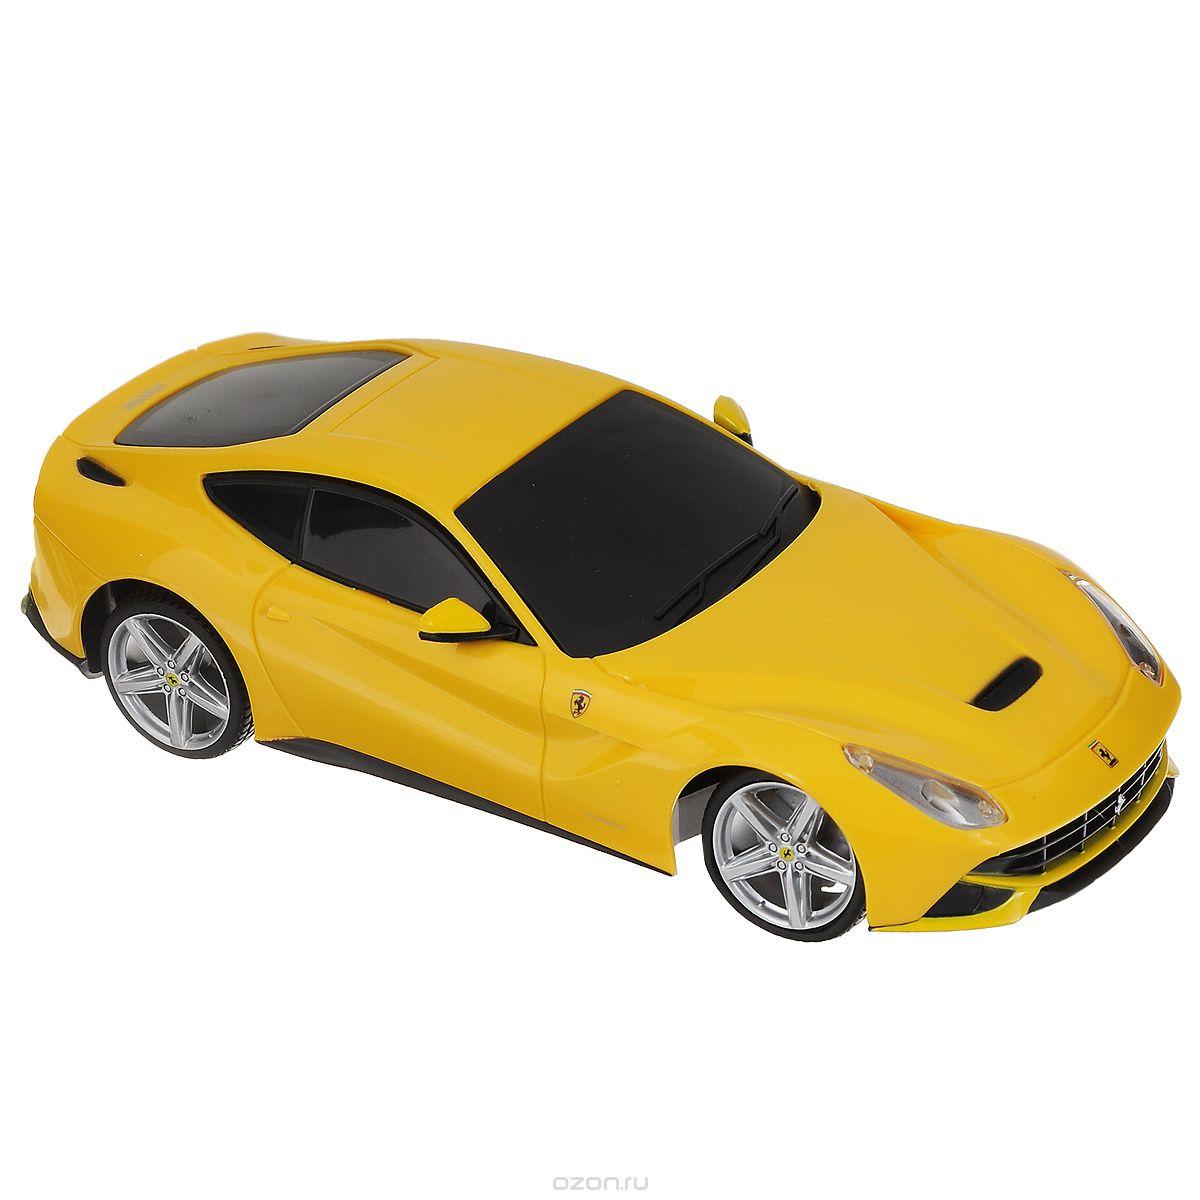 Maisto Радиоуправляемая модель Ferrari F12 Berlinetta цвет желтый масштаб 1:14 радиоуправляемая модель ferrari ff цвет красный масштаб 1 24